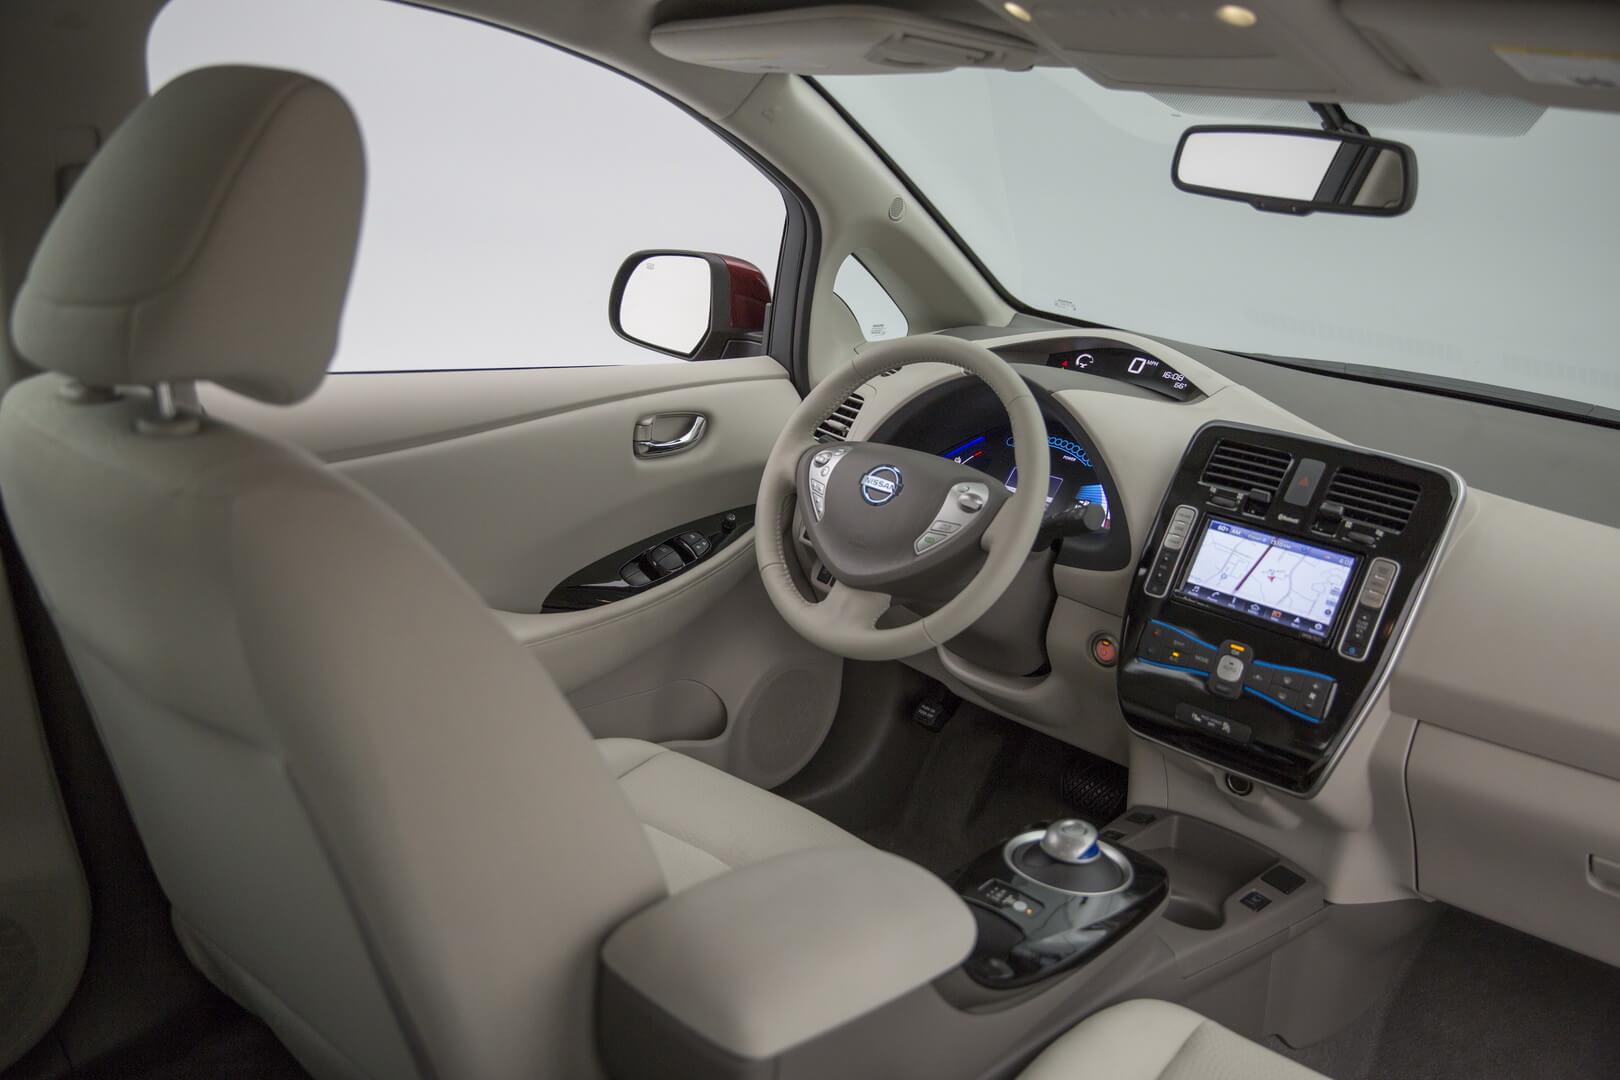 Фотография экоавто Nissan Leaf 2016 (24-30 кВт•ч) - фото 28